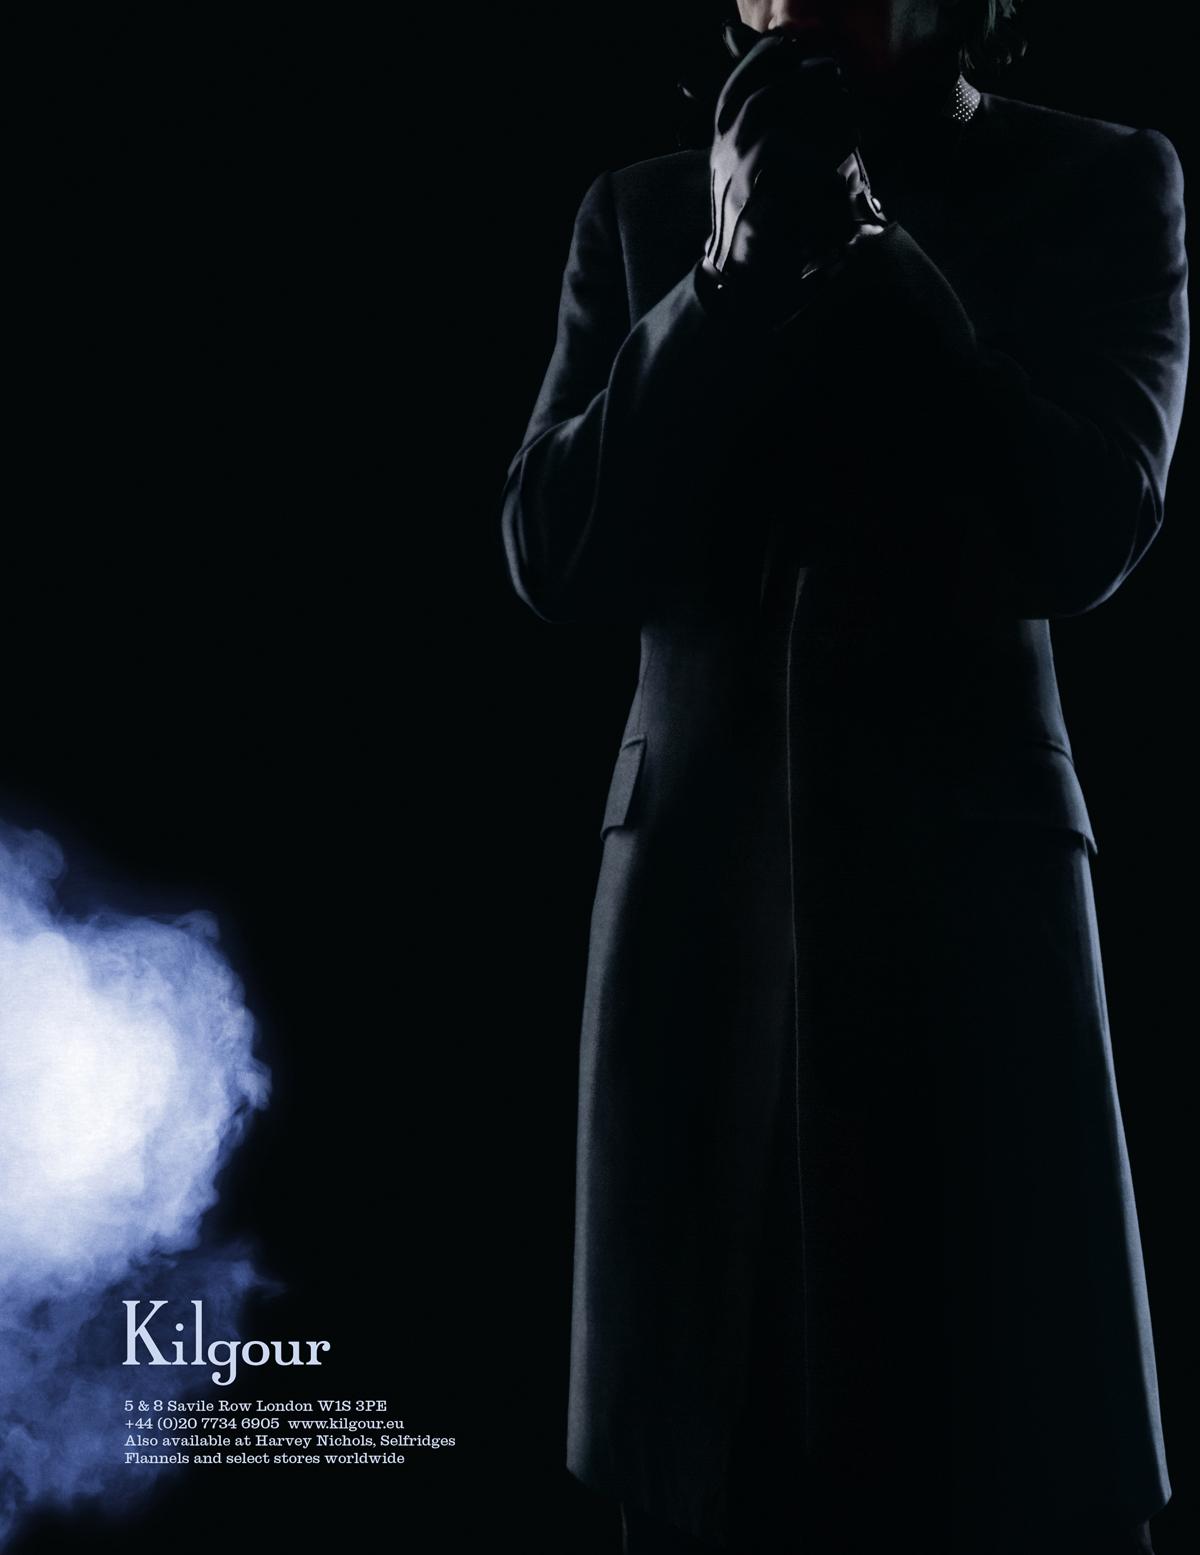 Kilgour AW 07.jpg